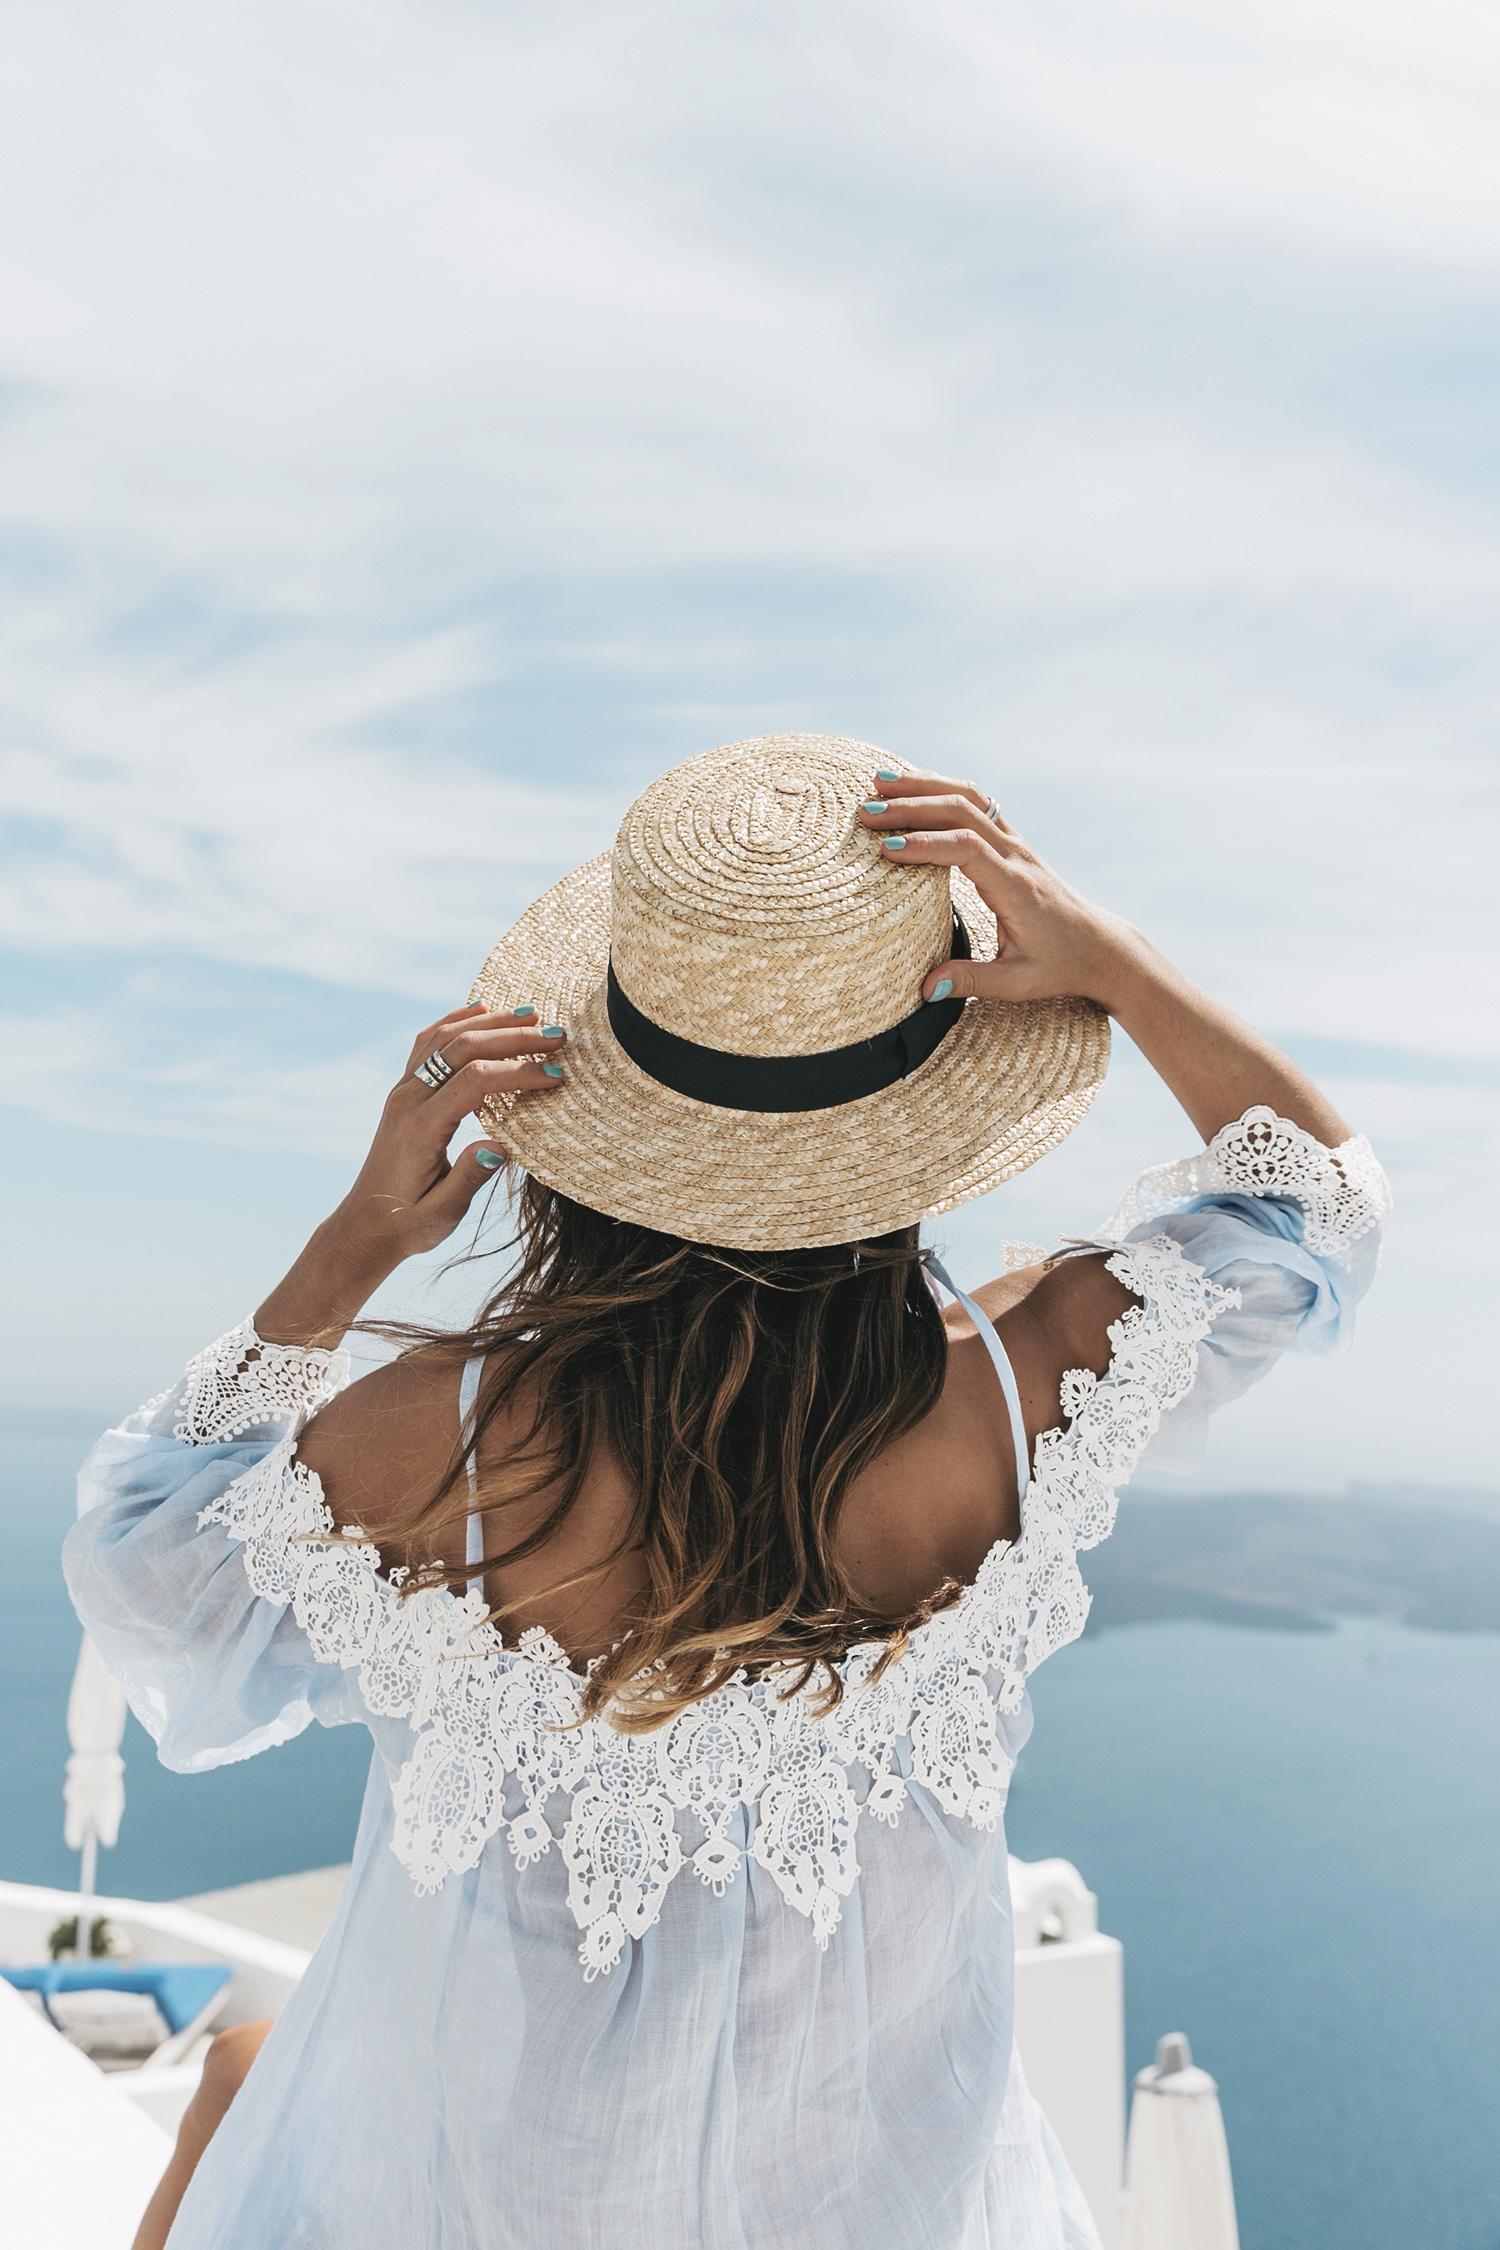 Blue_Dress-Soludos_Escapes-Soludos_Espadrilles-Canotier-Hat-Lack_Of_Color-Summer-Santorini-Collage_Vintage-67